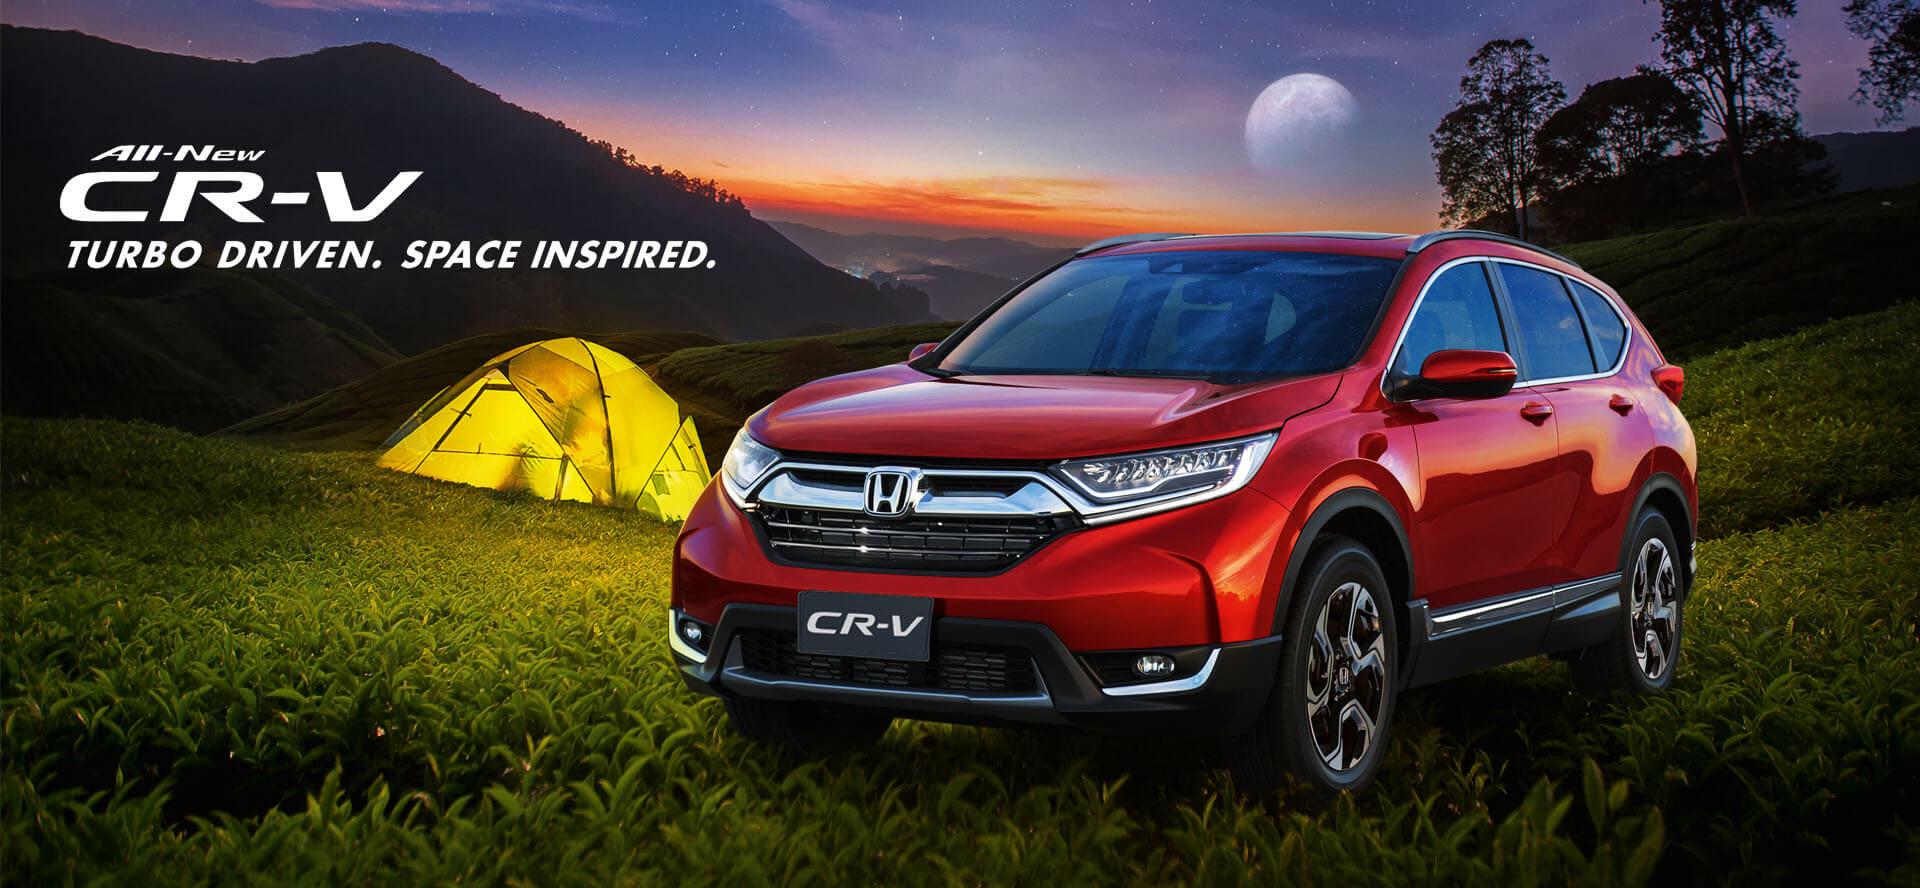 CR-V_Revised_1 Honda CR-V